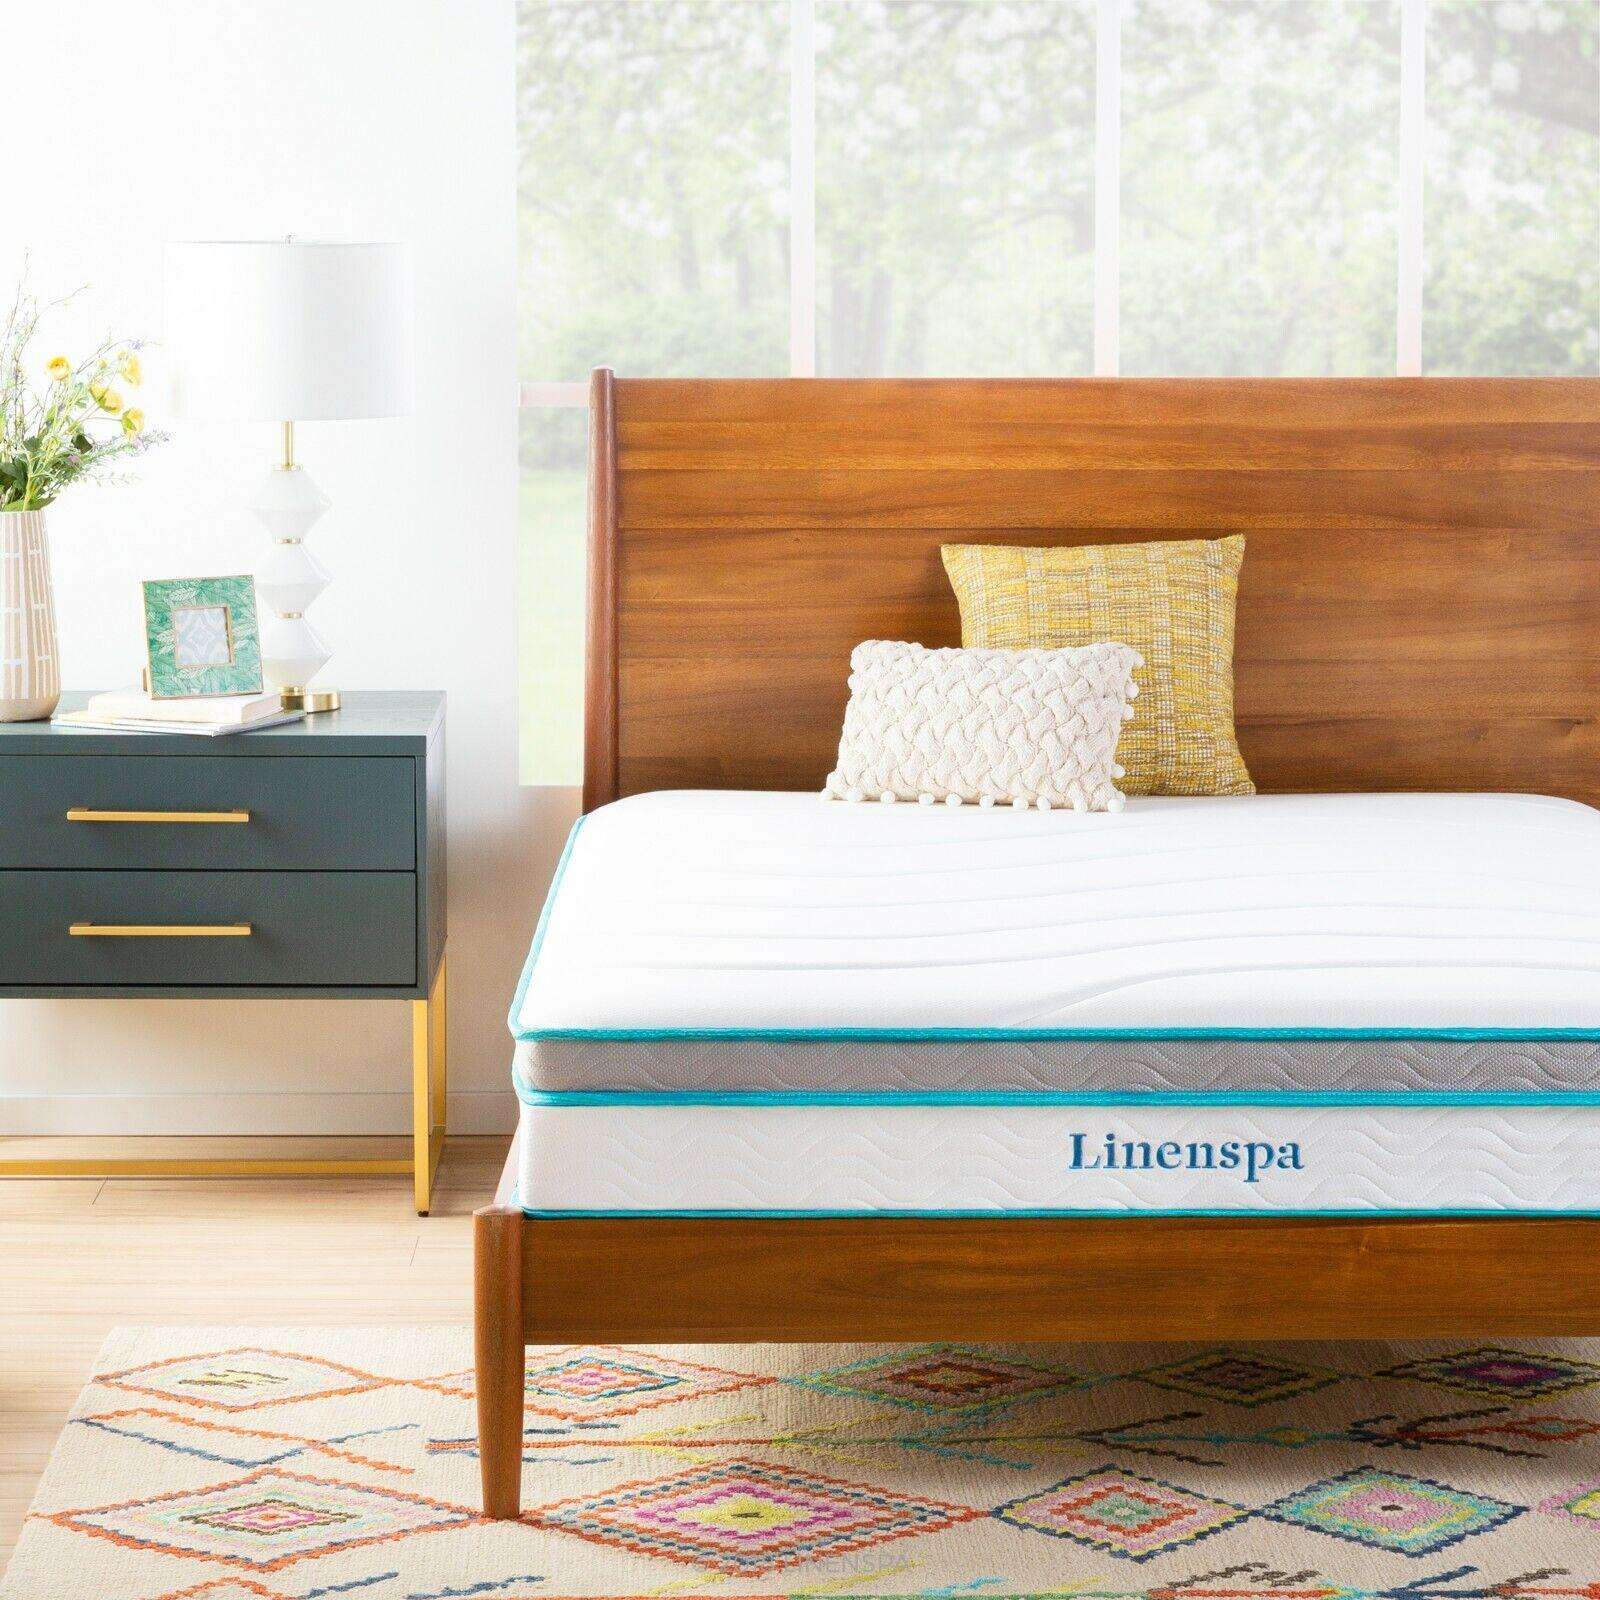 Linenspa 10 inch Hybrid Memory Foam + Spring Mattress Twin -